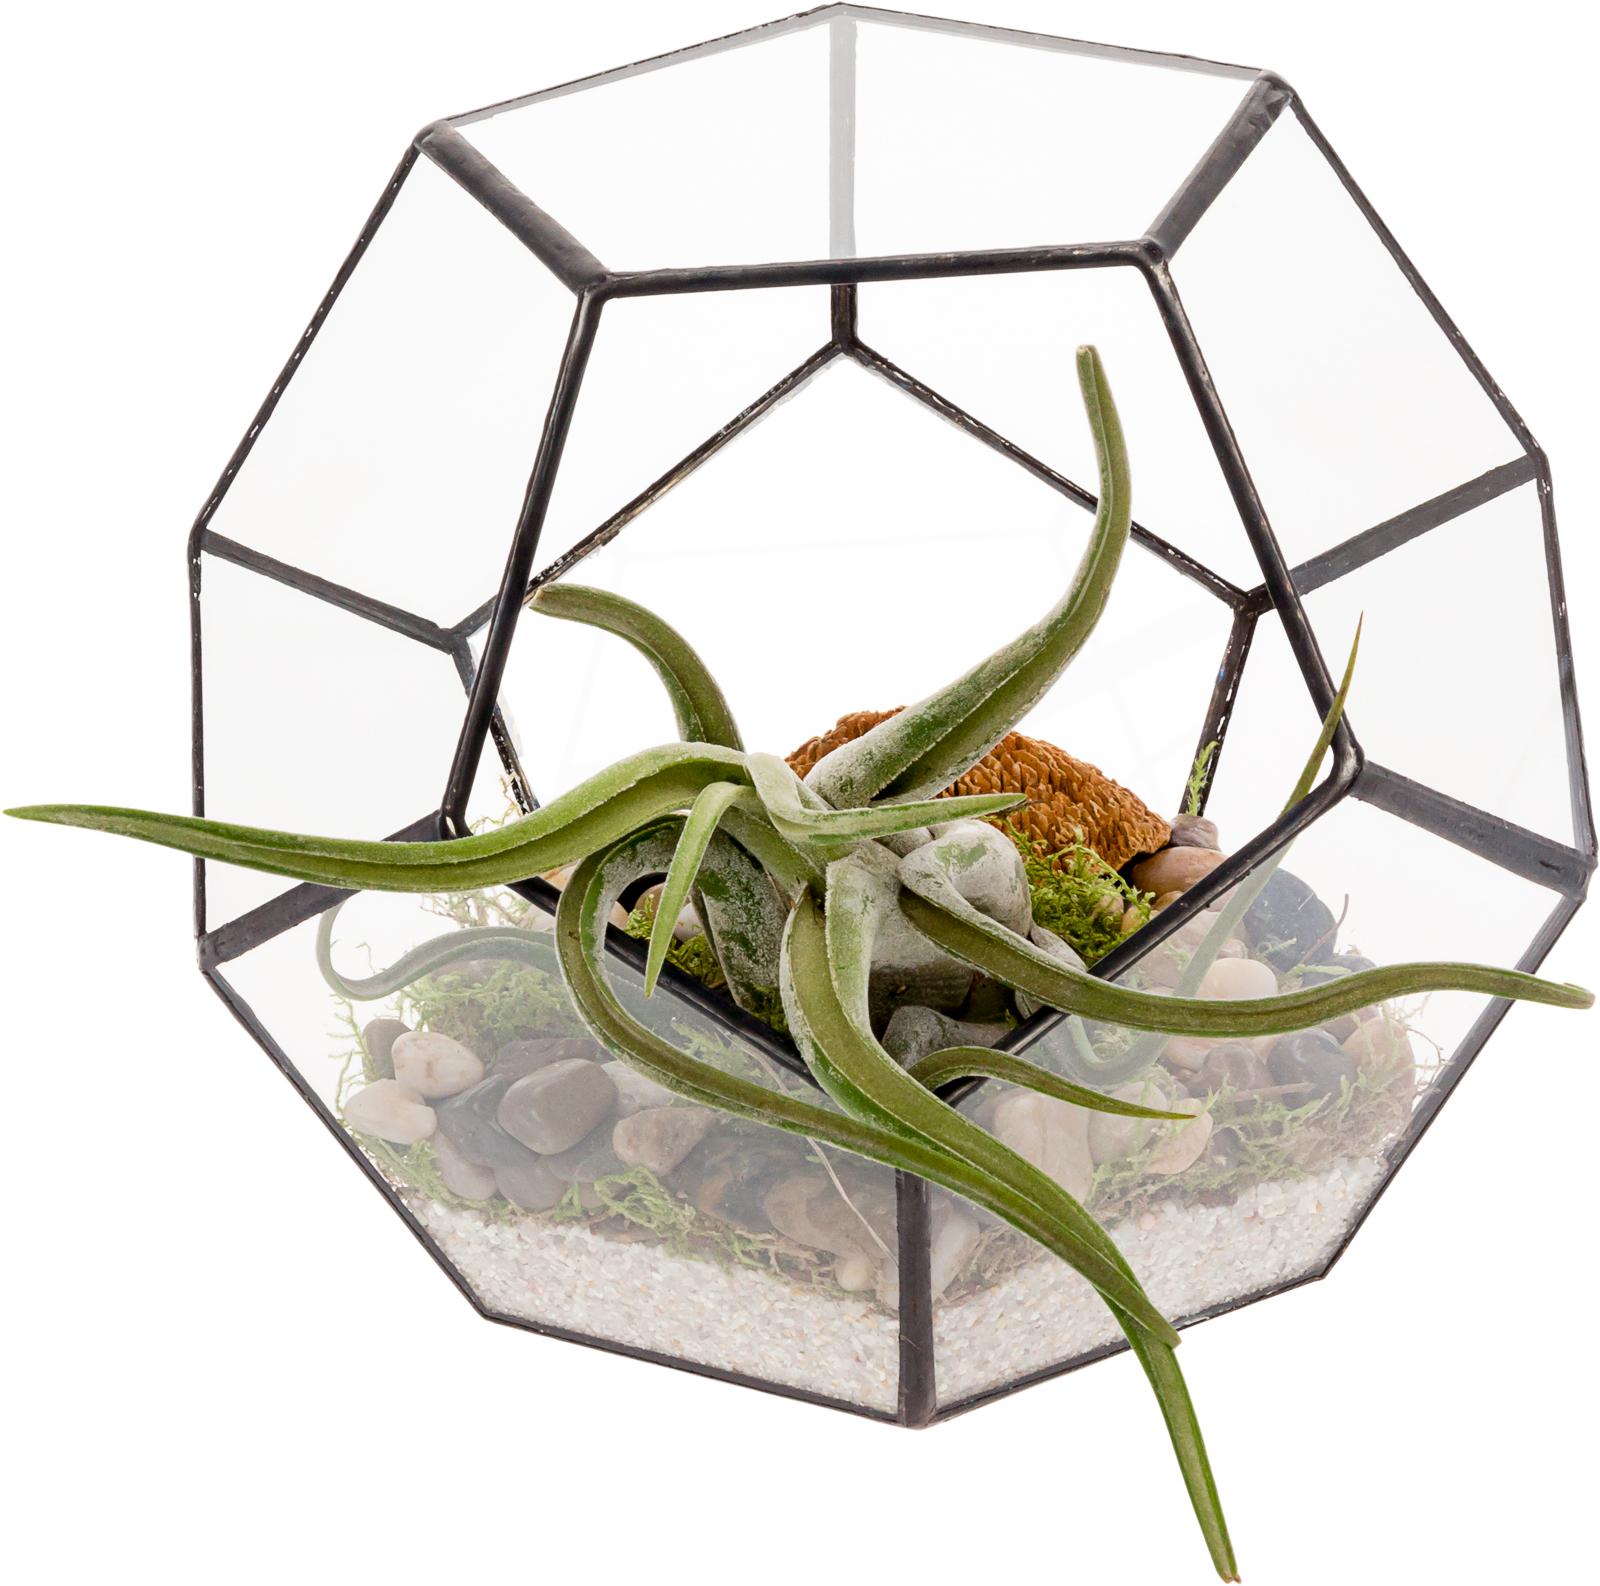 Mindful Design Geometric Dodecahedron Desktop Garden Planter Glass Terrarium